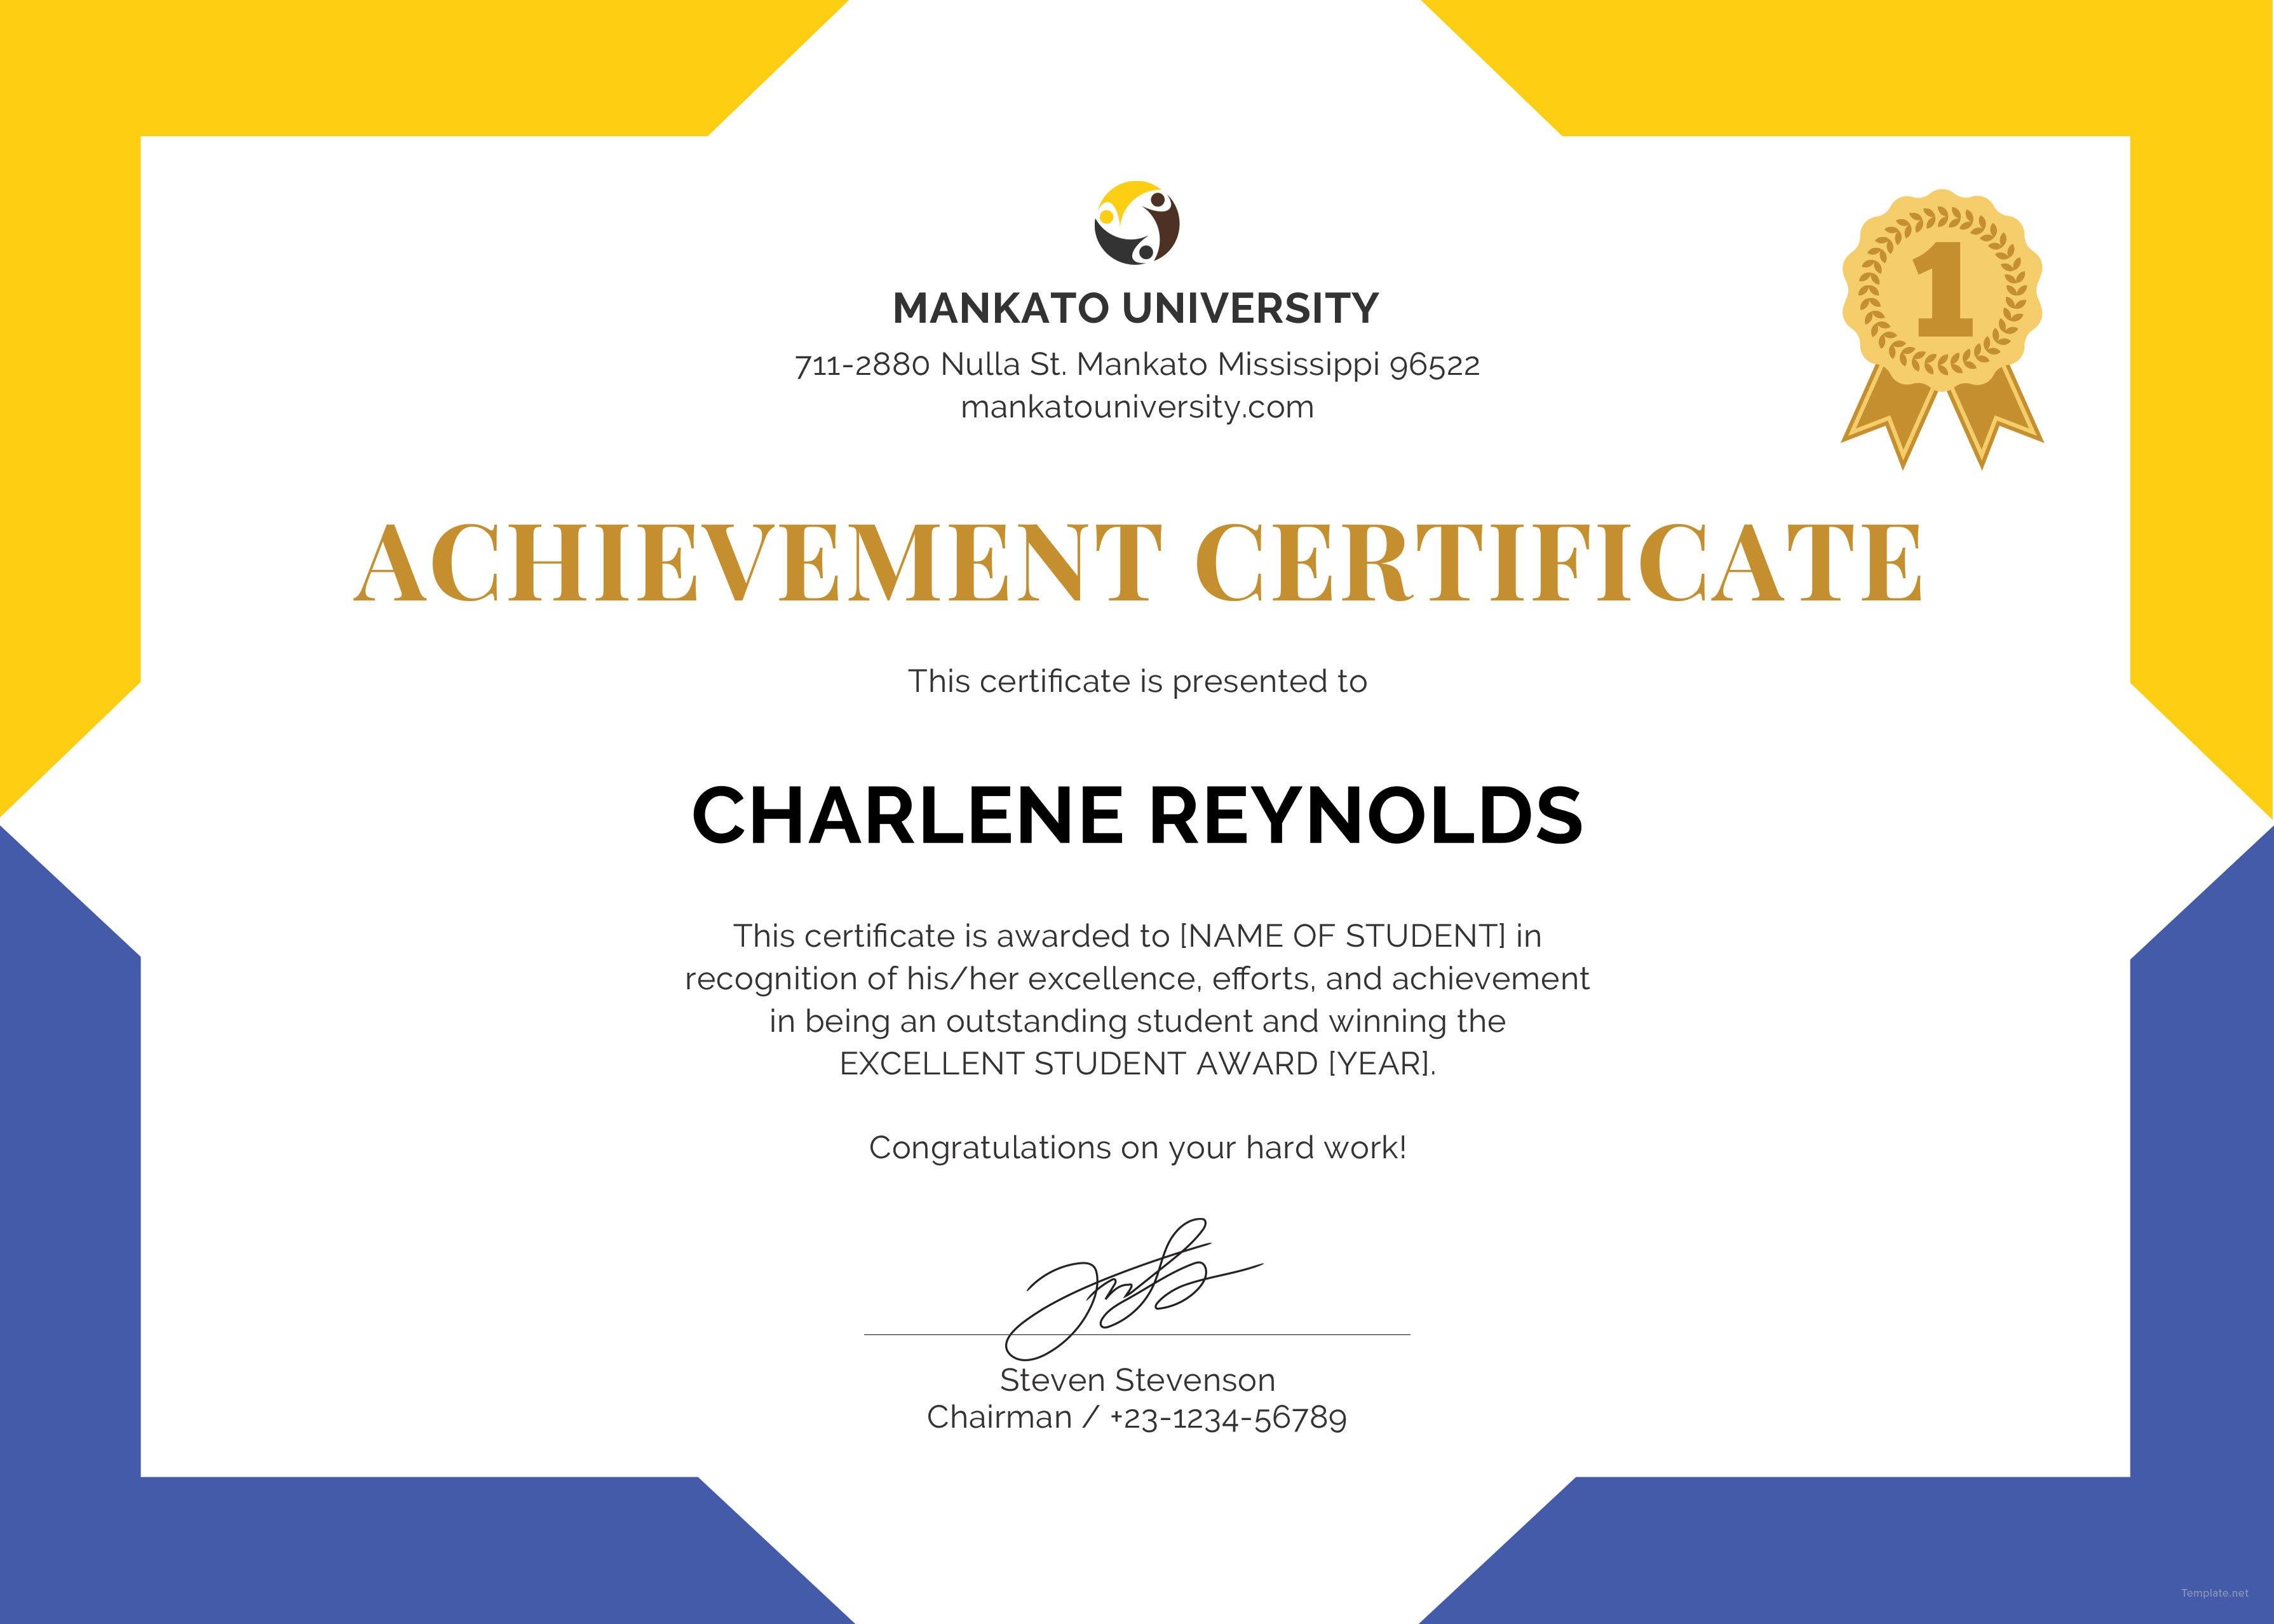 Certificate Templates For School  – Elsik Blue Cetane With Regard To Certificate Templates For School